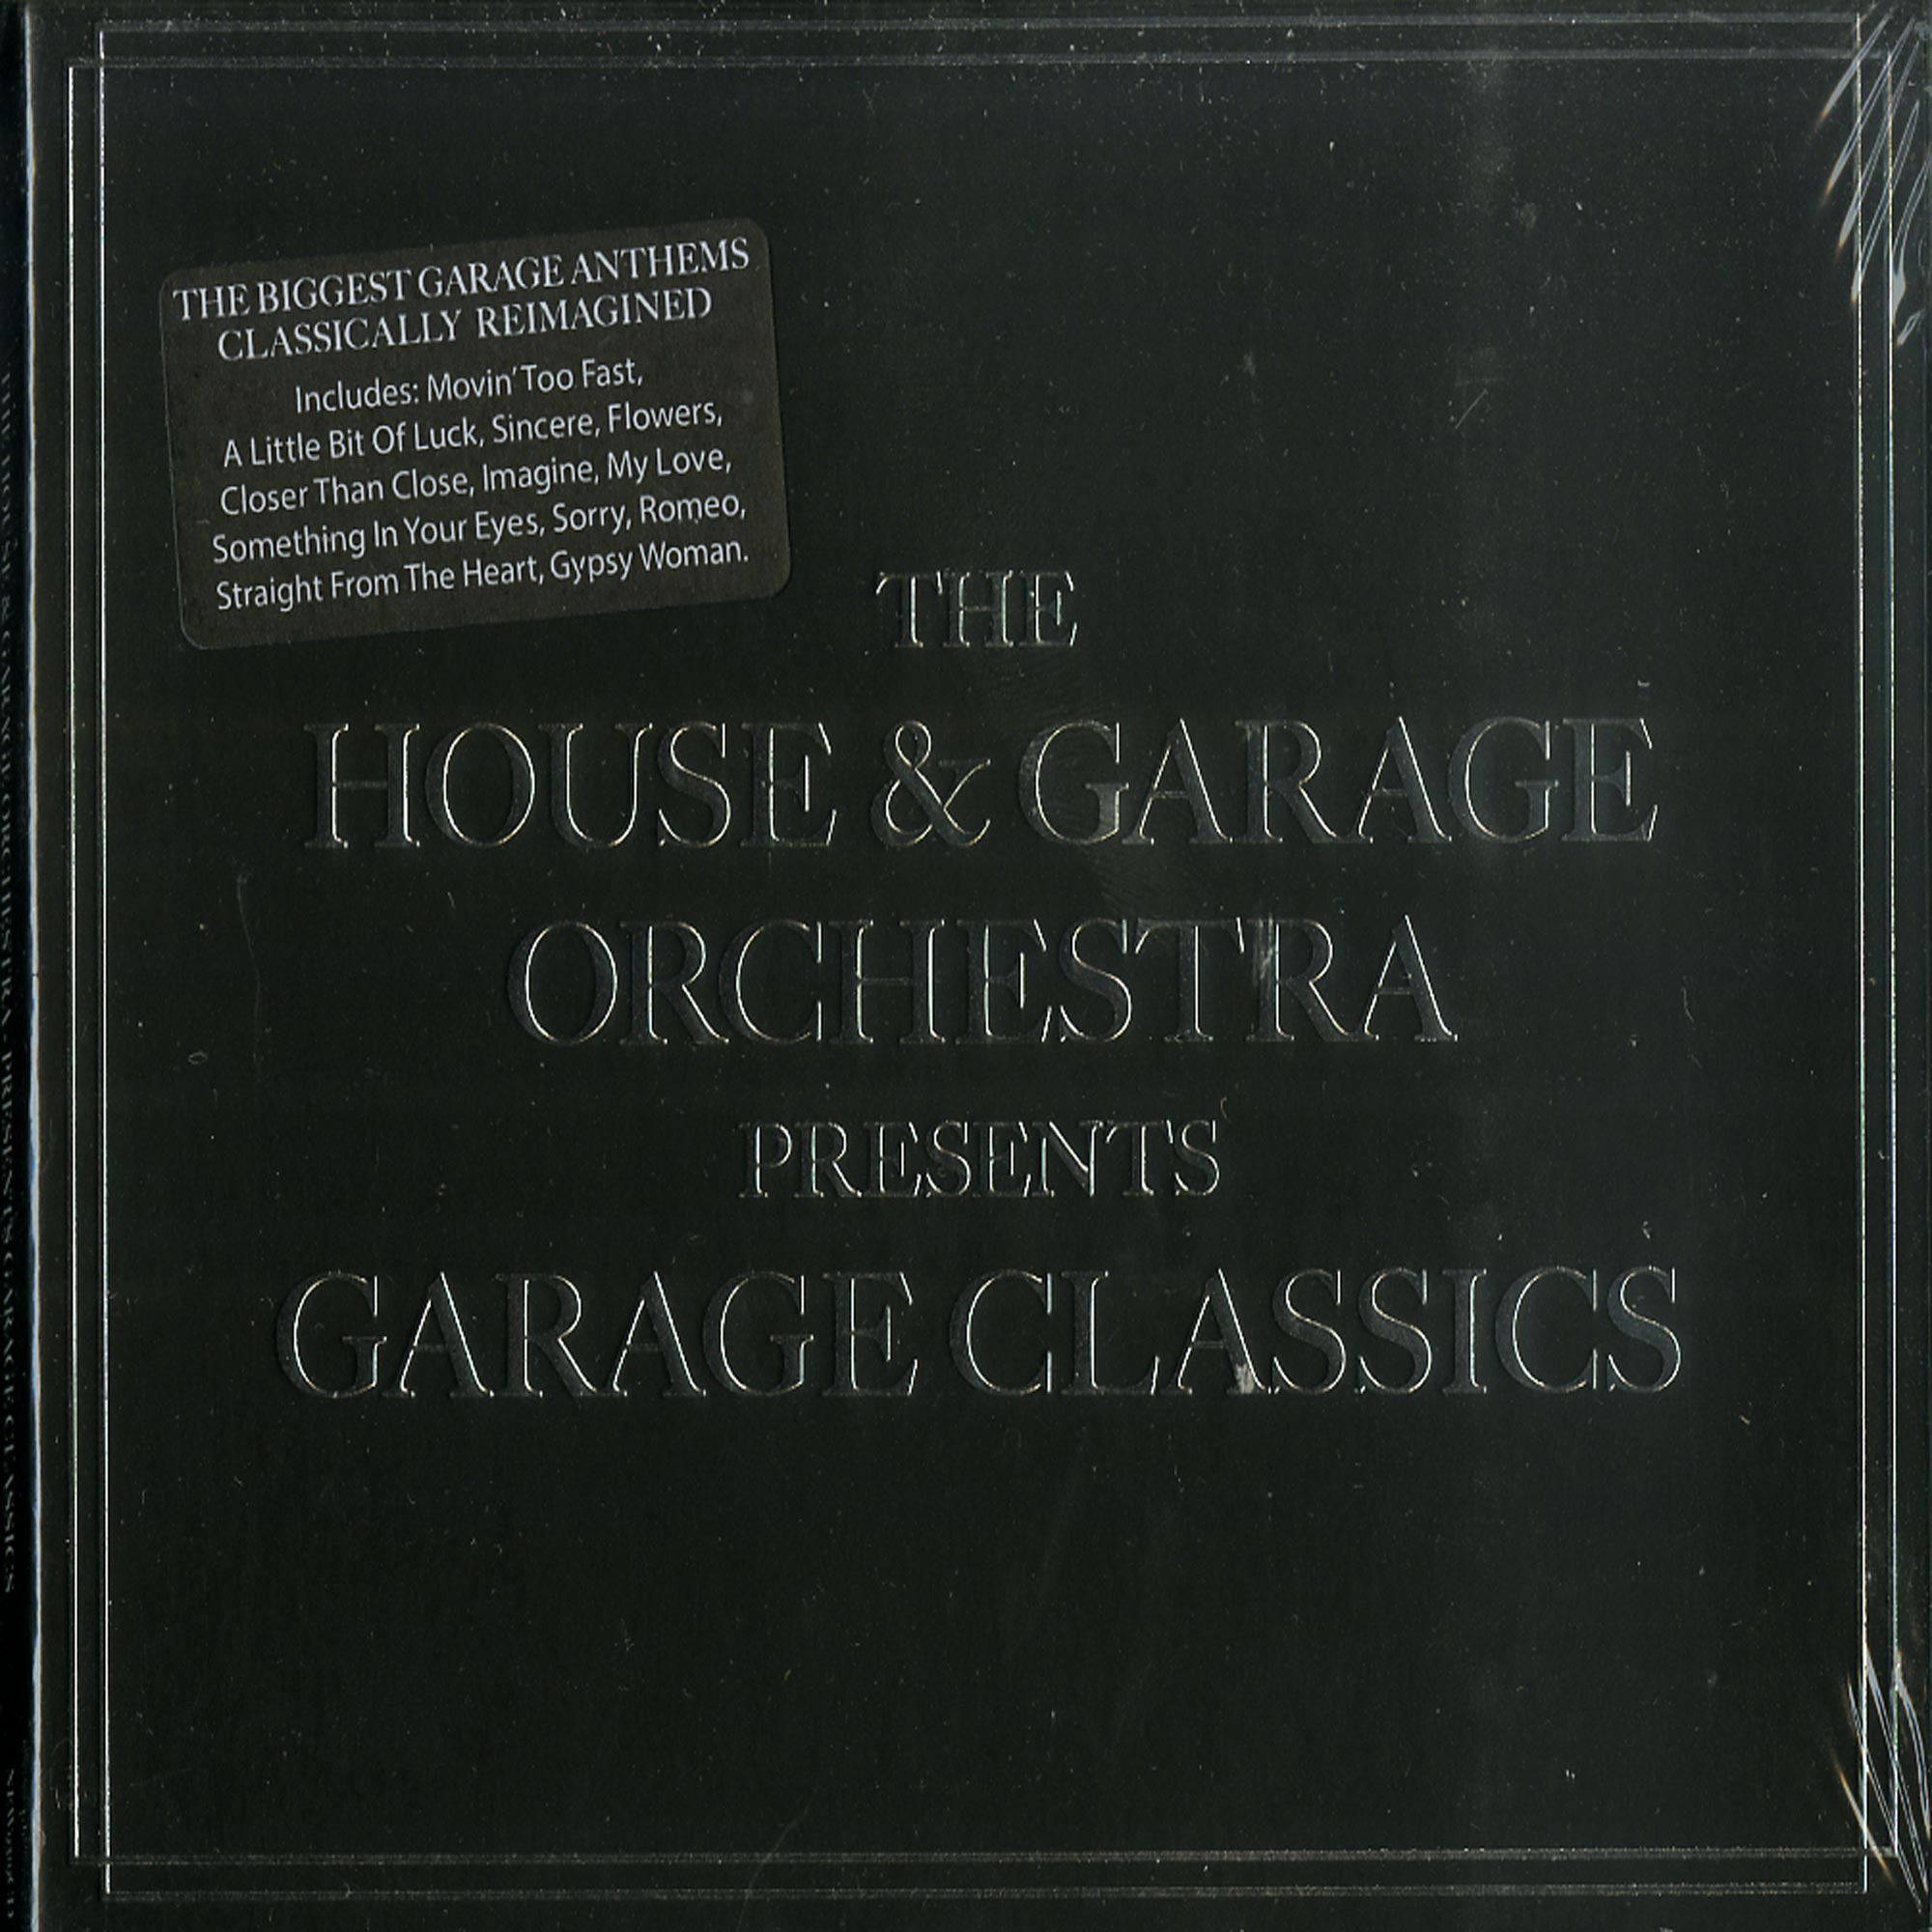 The House & Garage Orchestra - GARAGE CLASSICS